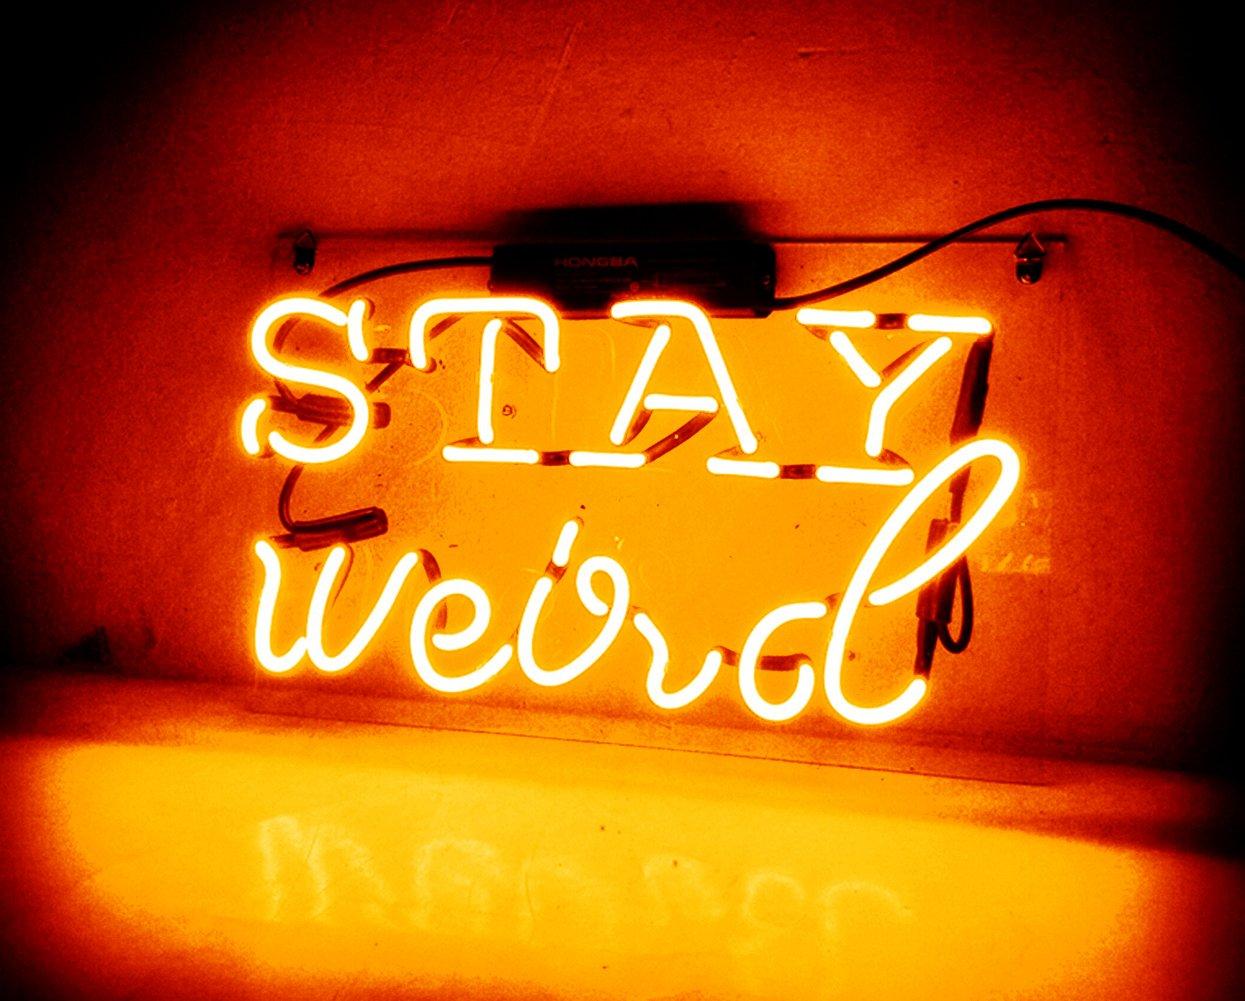 Night Light for Kids Girls Adults Neon Sign Glass Handmade Custom Gift Home Decoration Light Lamp Wall Decor - for Home, Bedroom, Hallway, Stairways, Garage, Windows, Beer, Bar - STAY weird